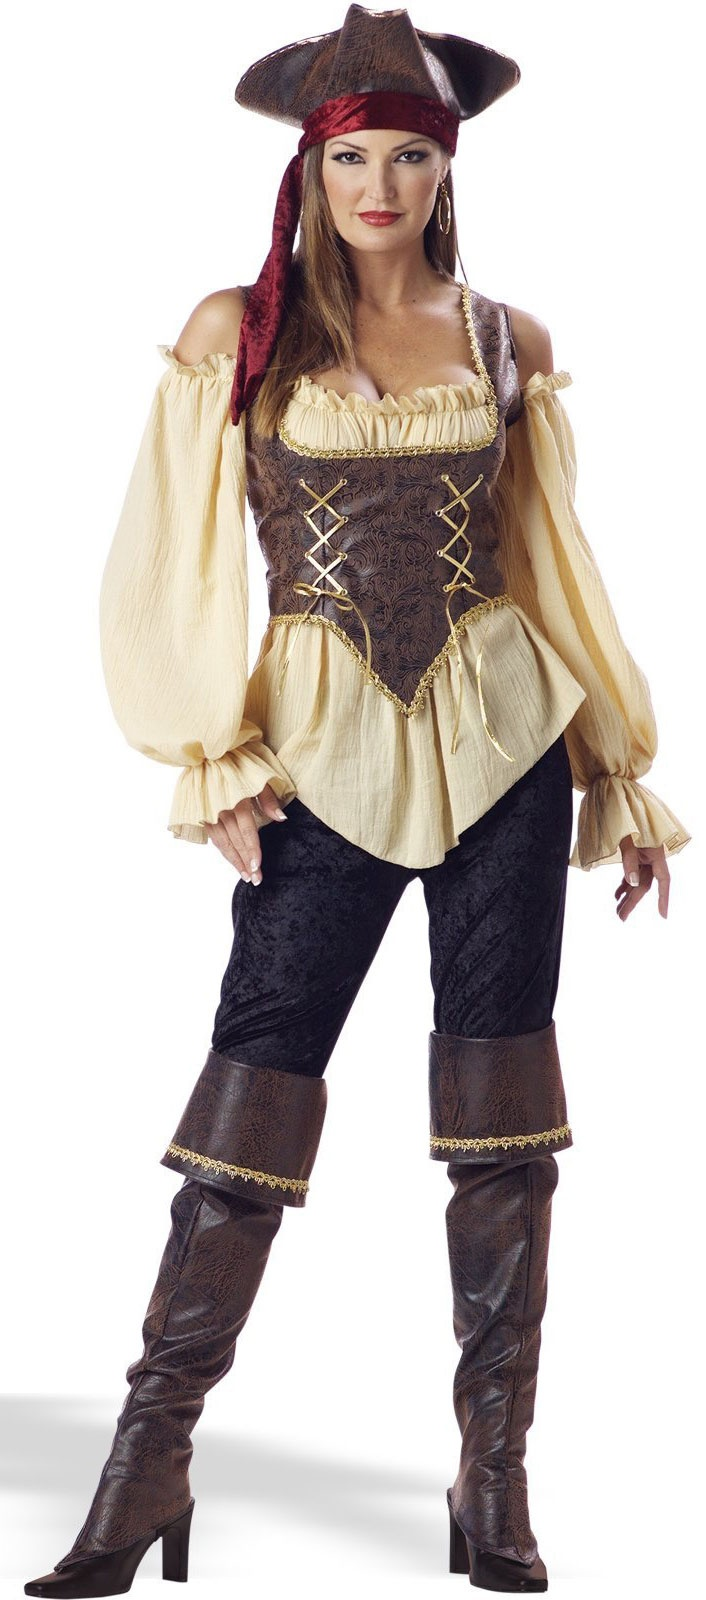 Adult Rustic Pirate Lady Costume - Mr. Costumes